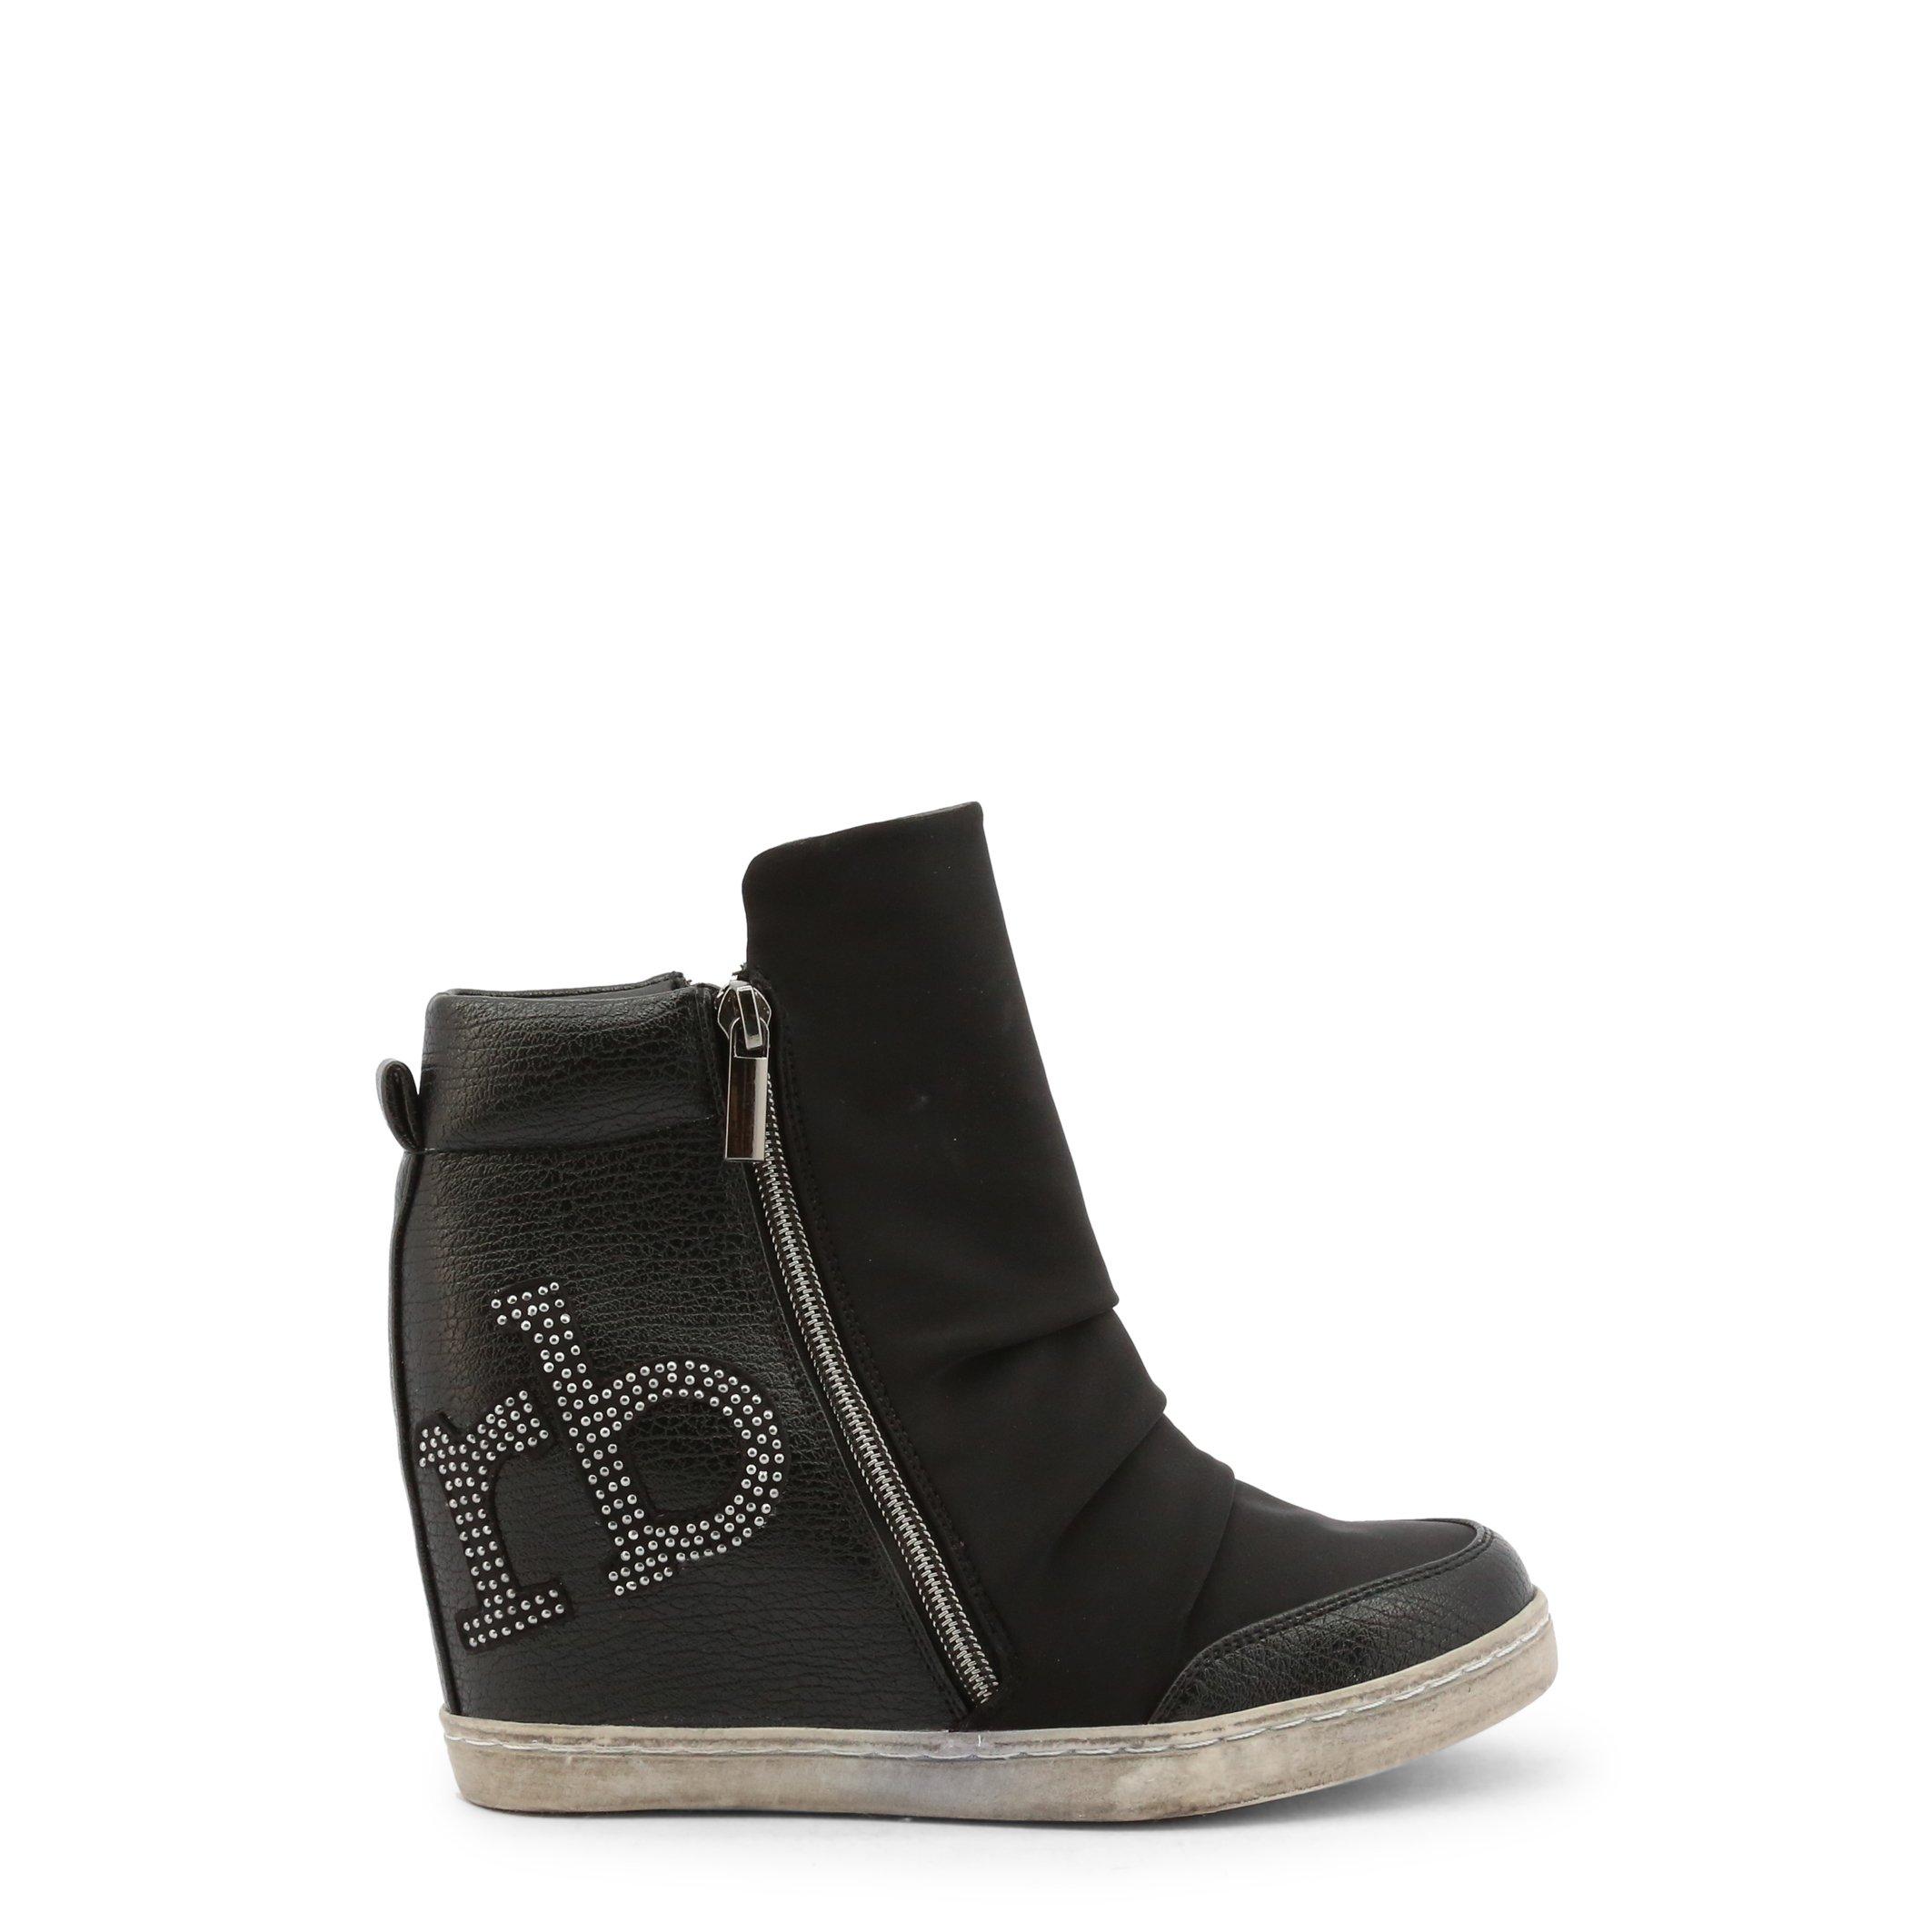 Roccobarocco Women's Ankle Boot Various Colours RBSC1JL01STD - black EU 37